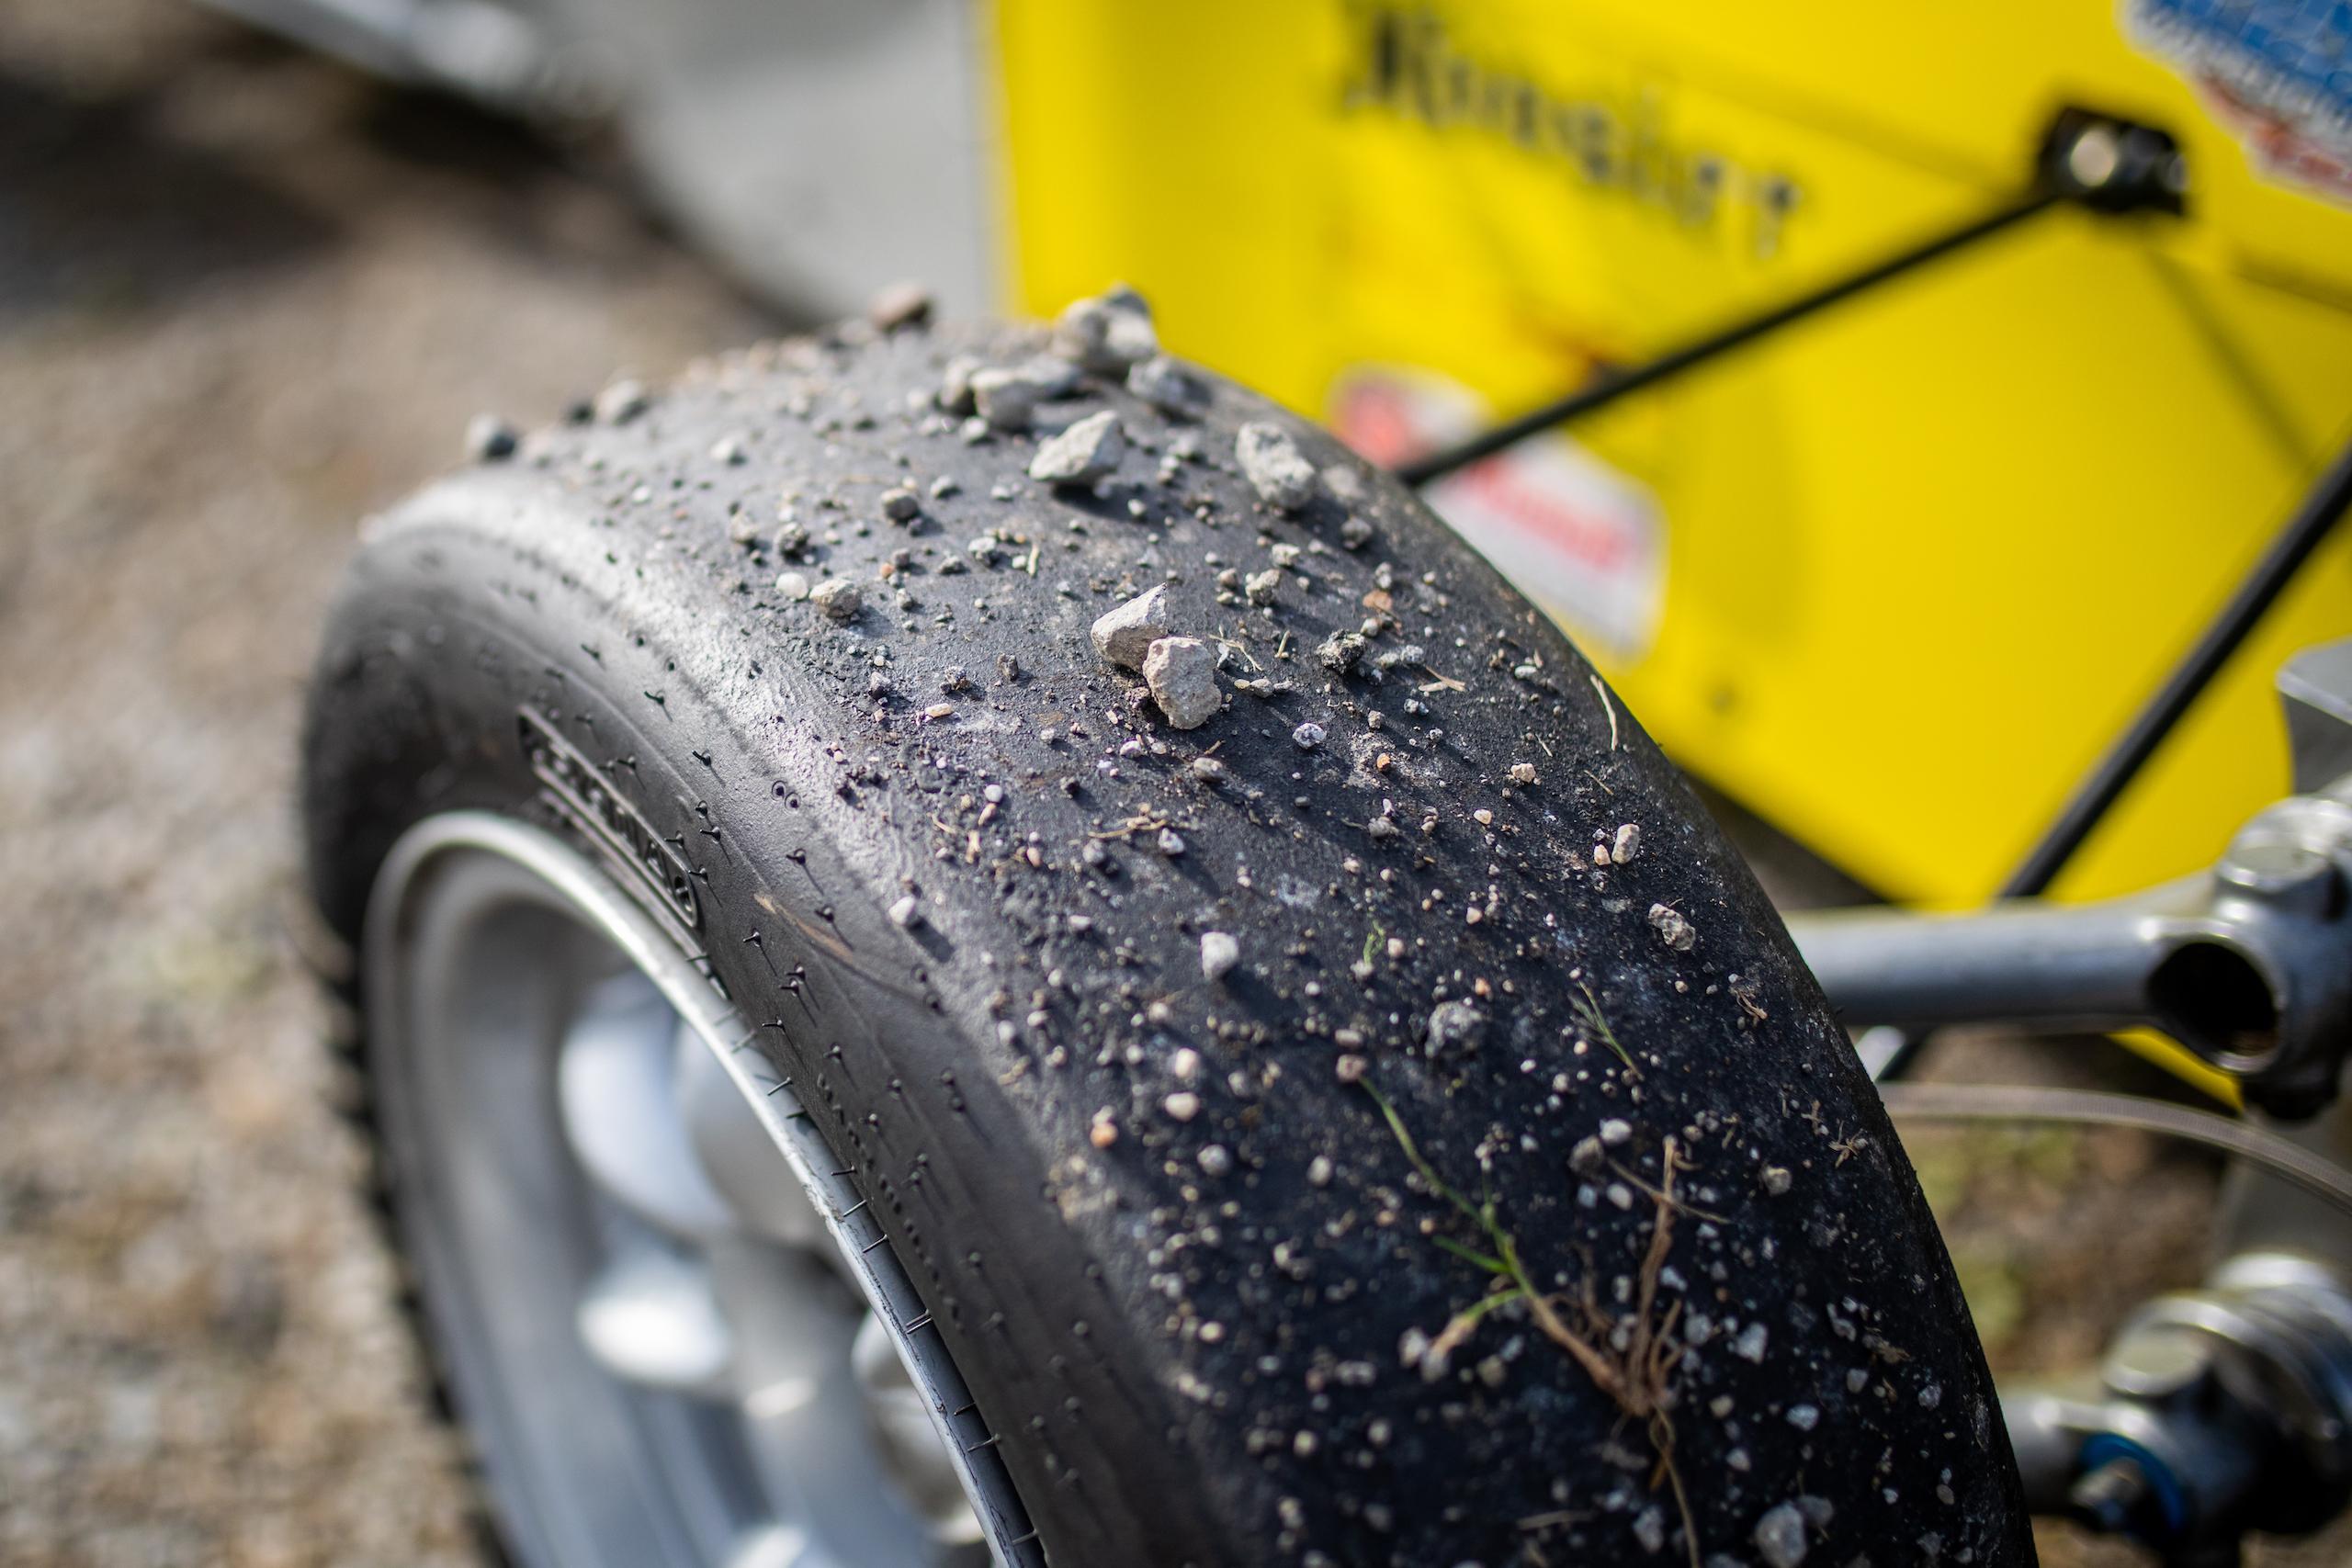 Formula First racecar tire gravel